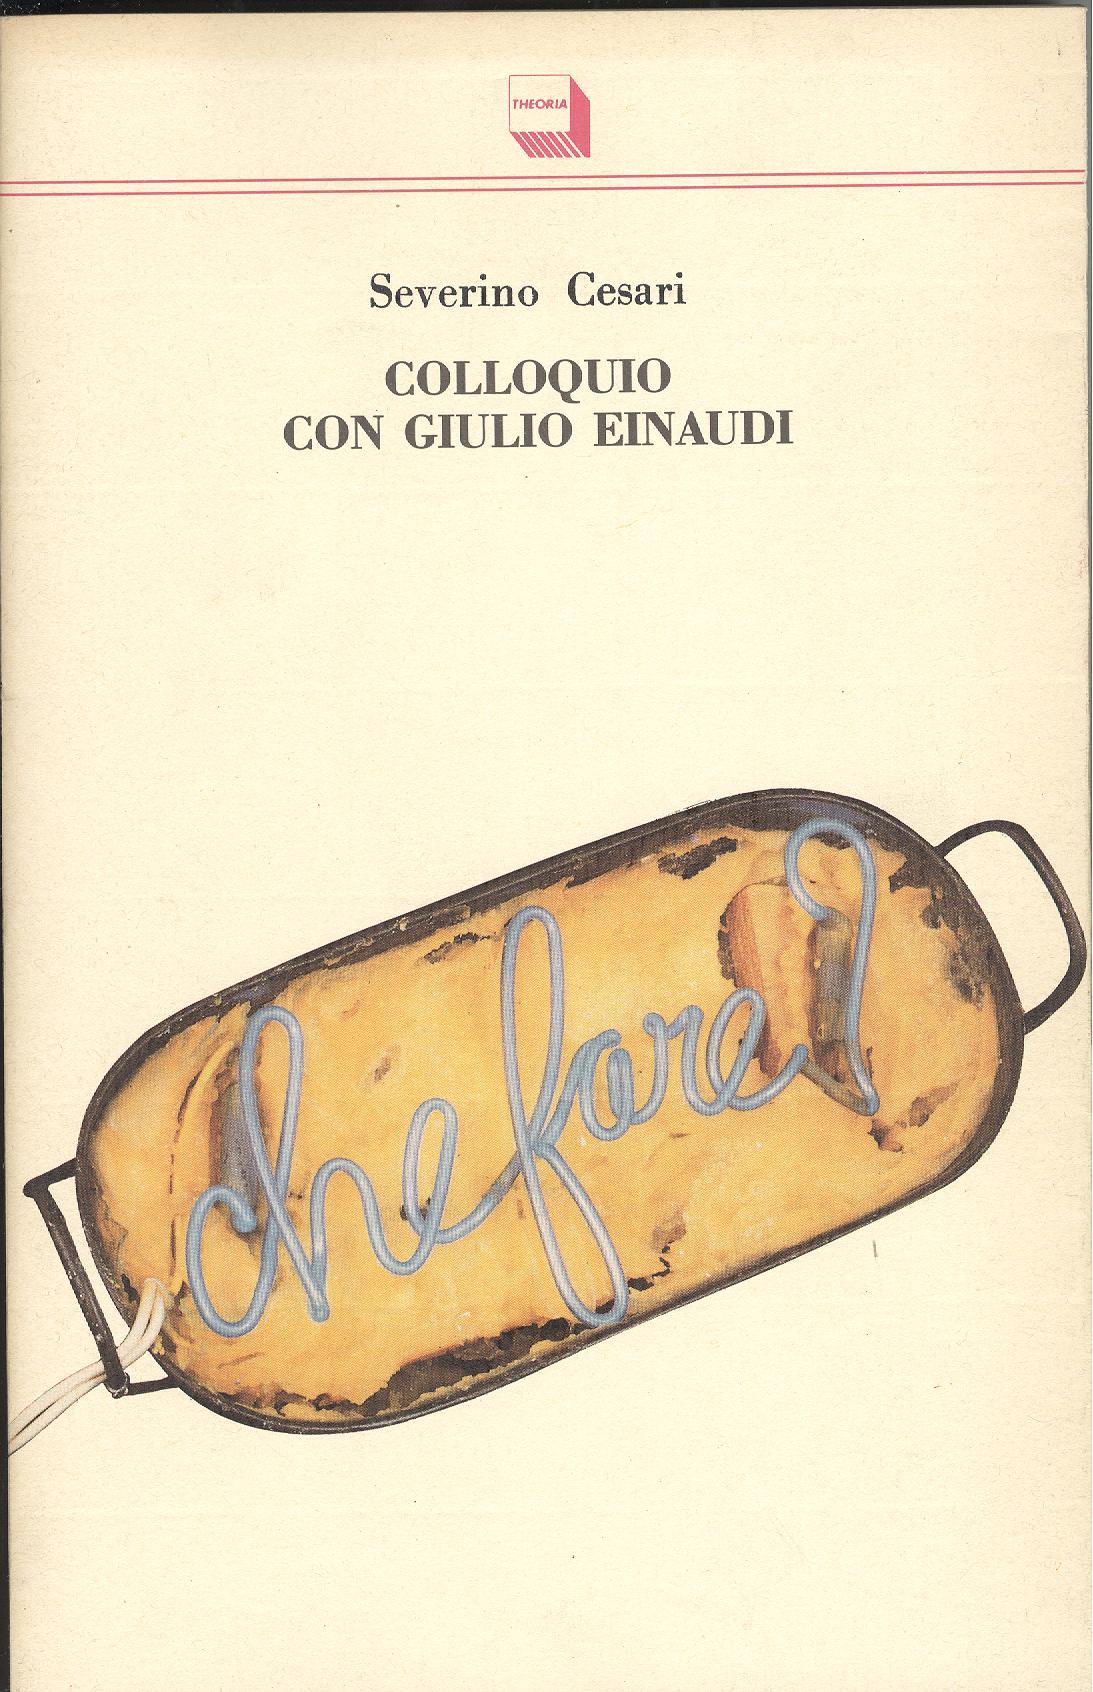 Colloquio con Giulio Einaudi